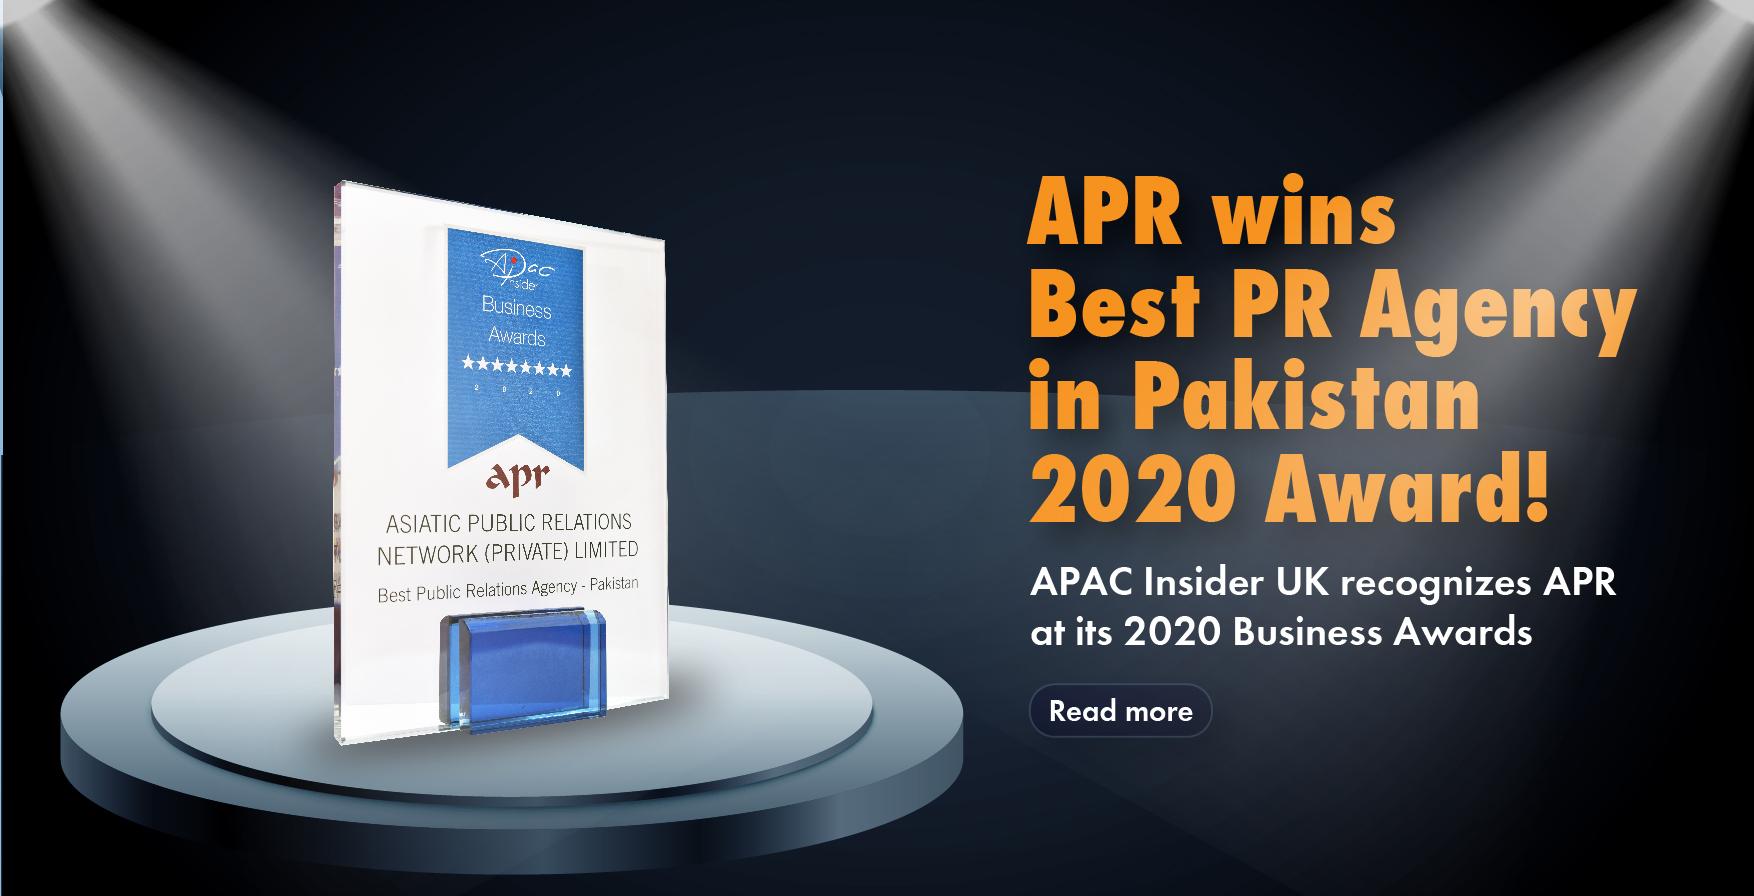 APR Award 2020